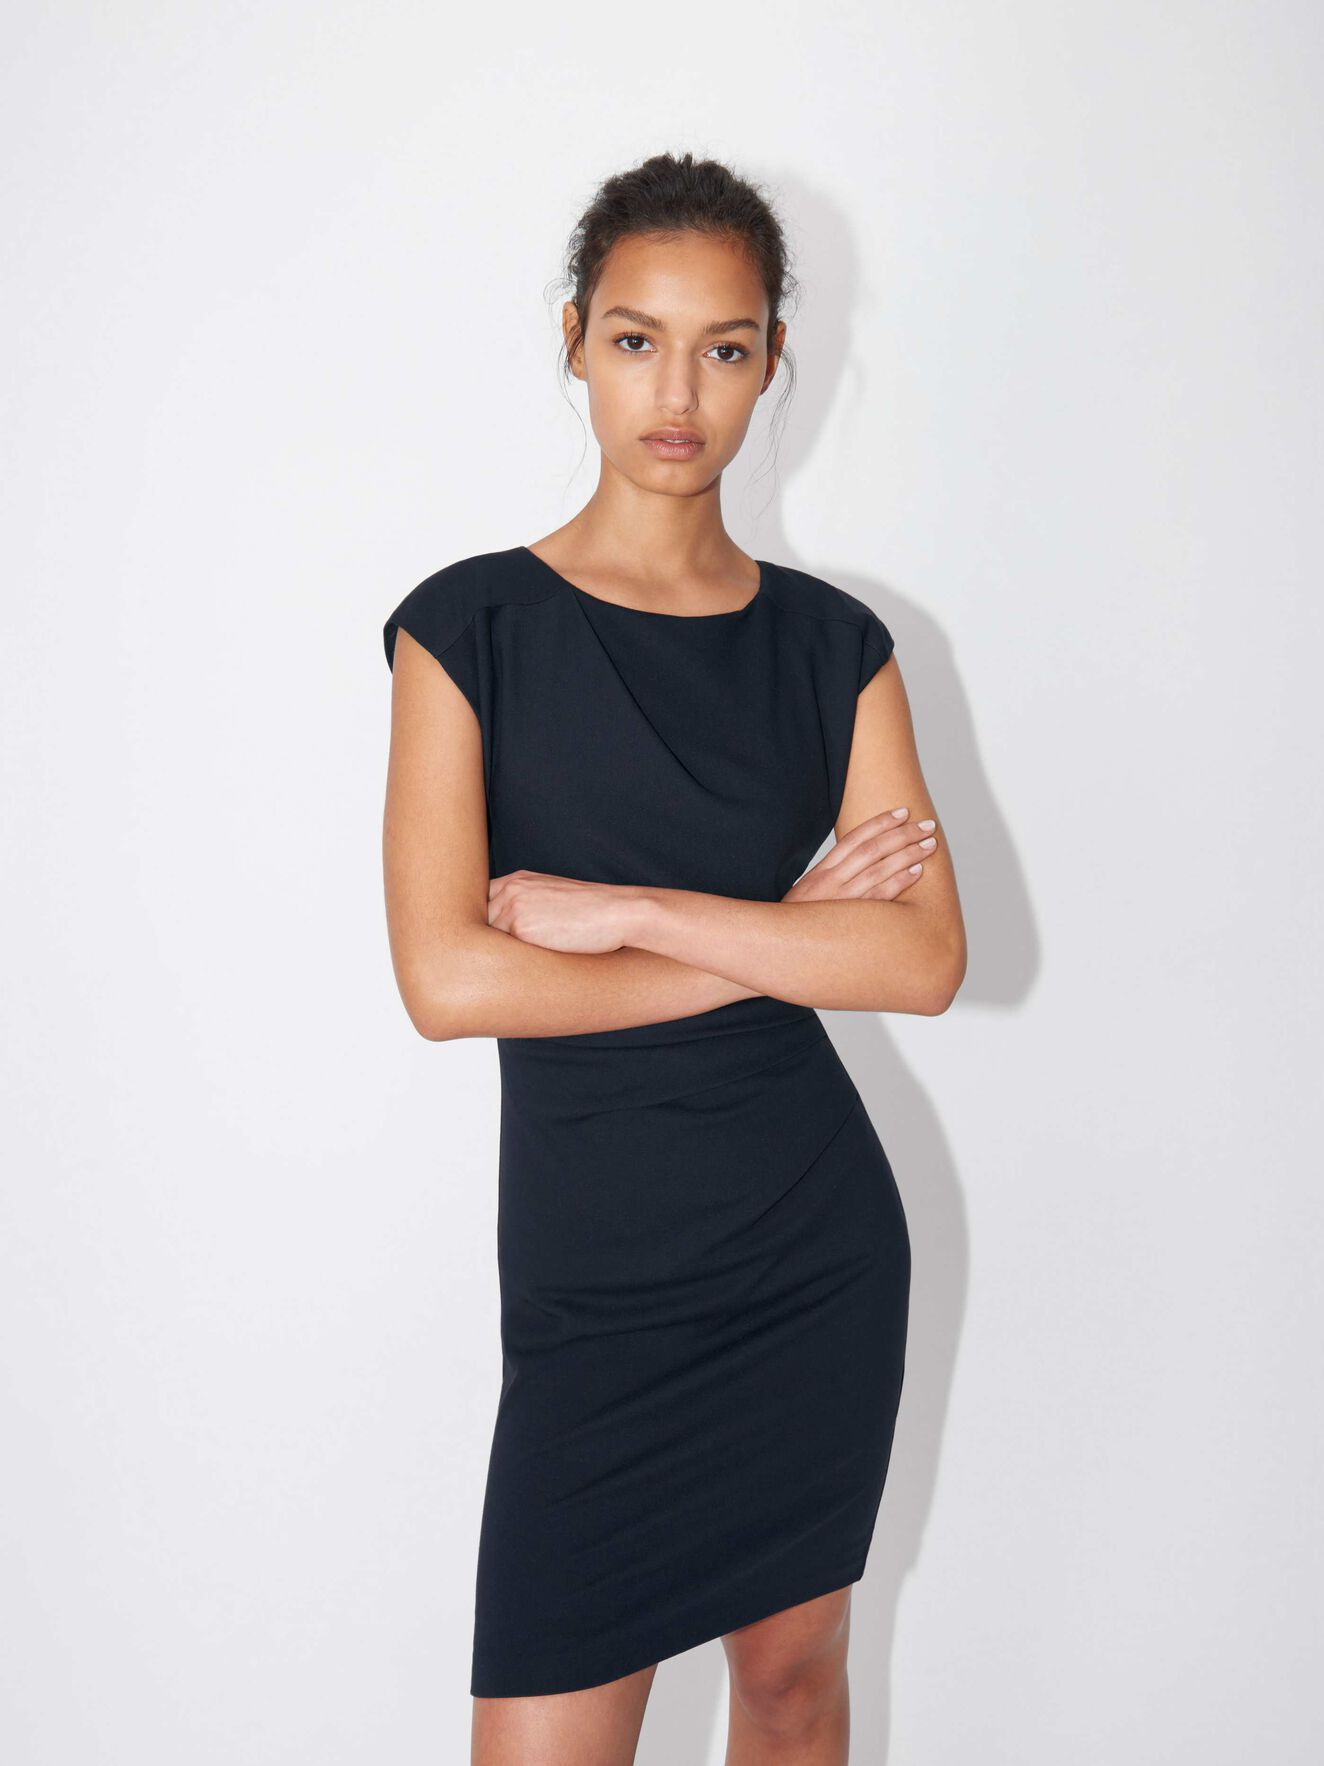 Mi stretch dress  in Light Ink from Tiger of Sweden